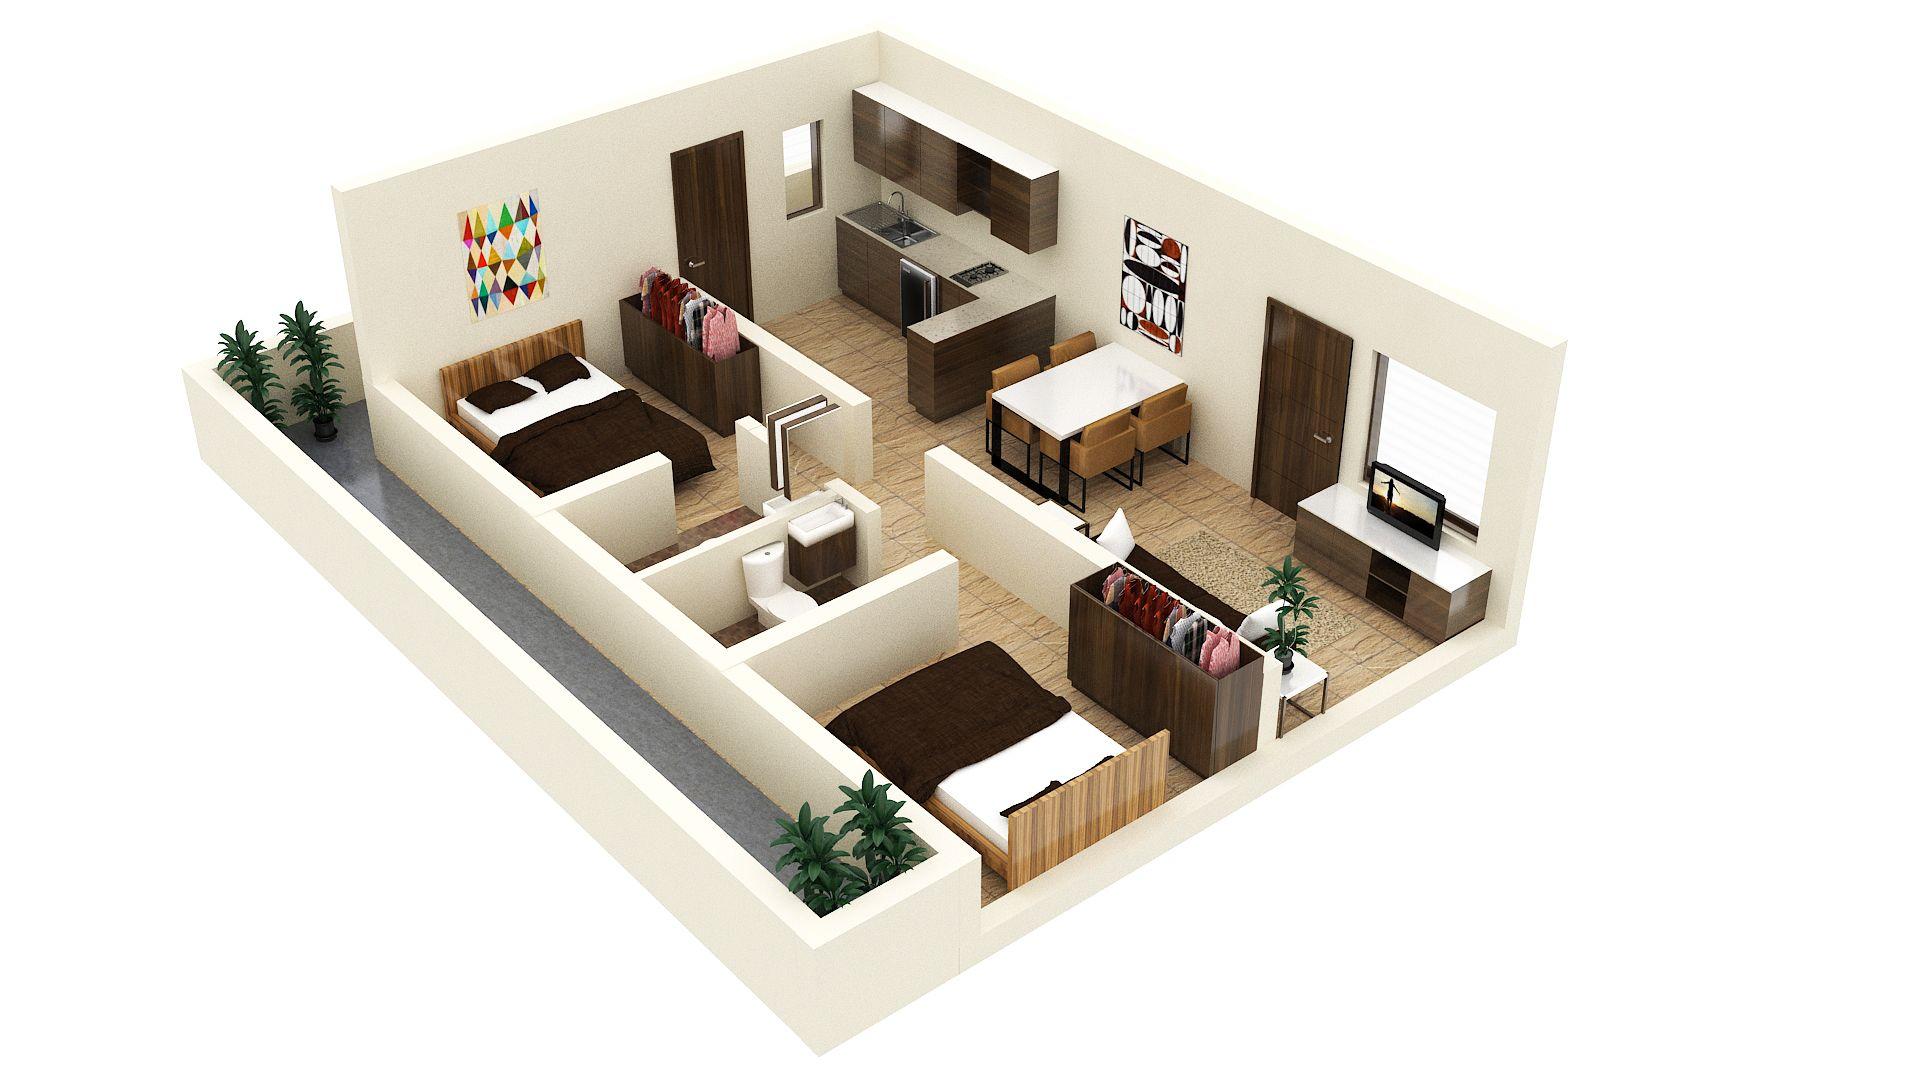 Two Bed Studio Apartment Floor Plan Idea Tiny House Design